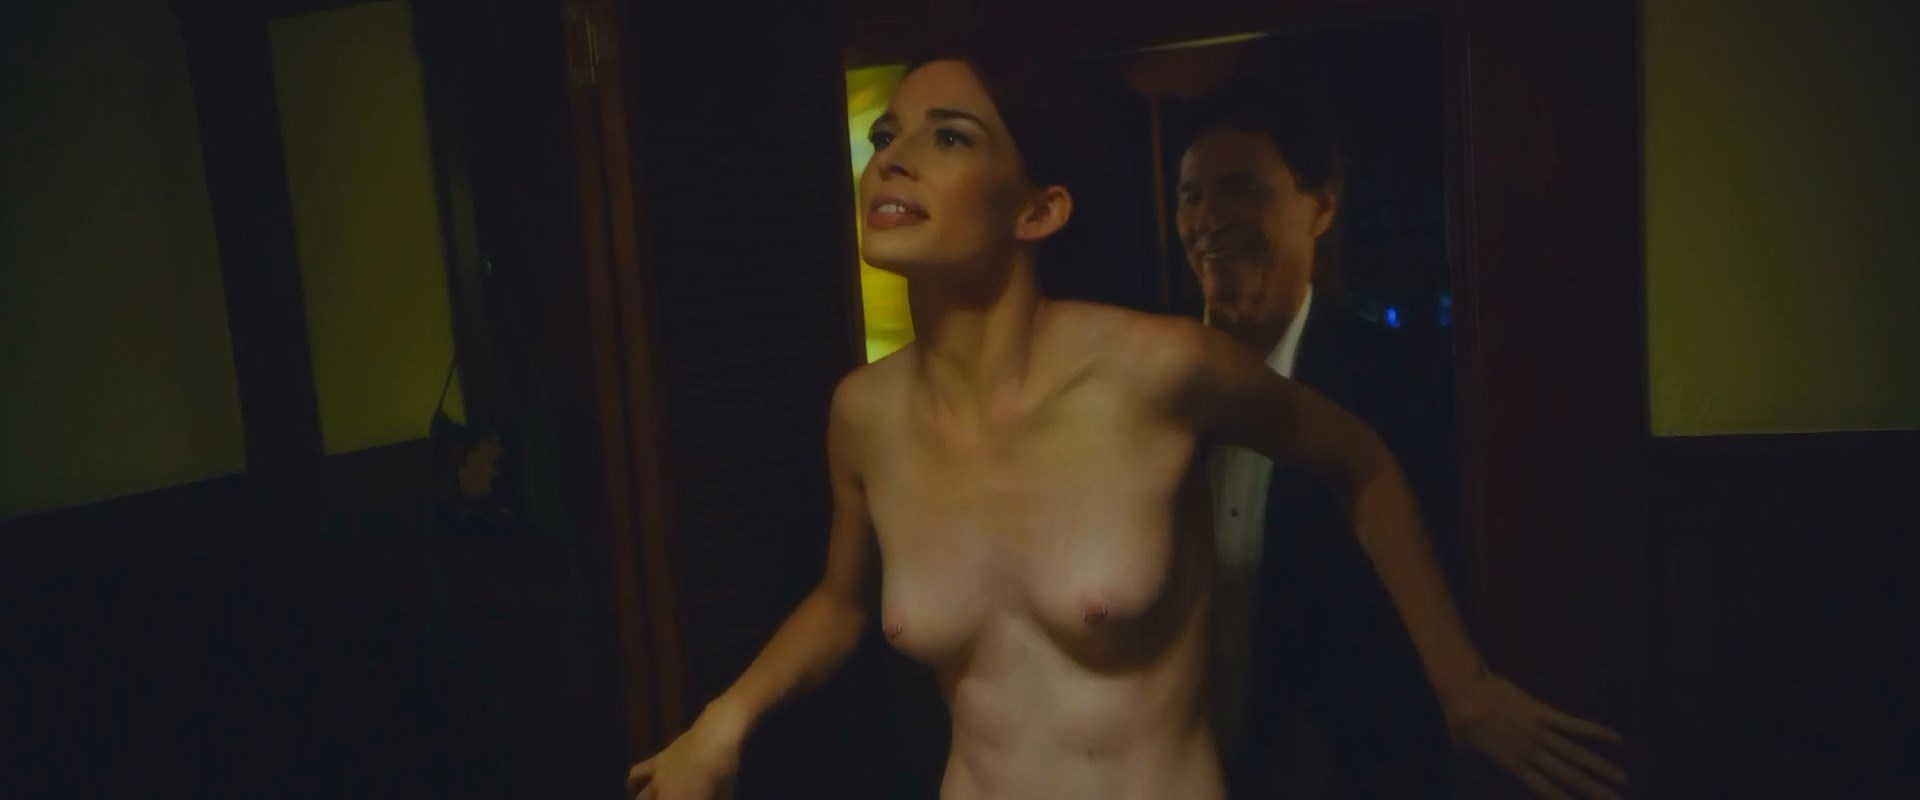 Chloe Dykstra nude, Ana Foxx nude - Diminuendo (2018)